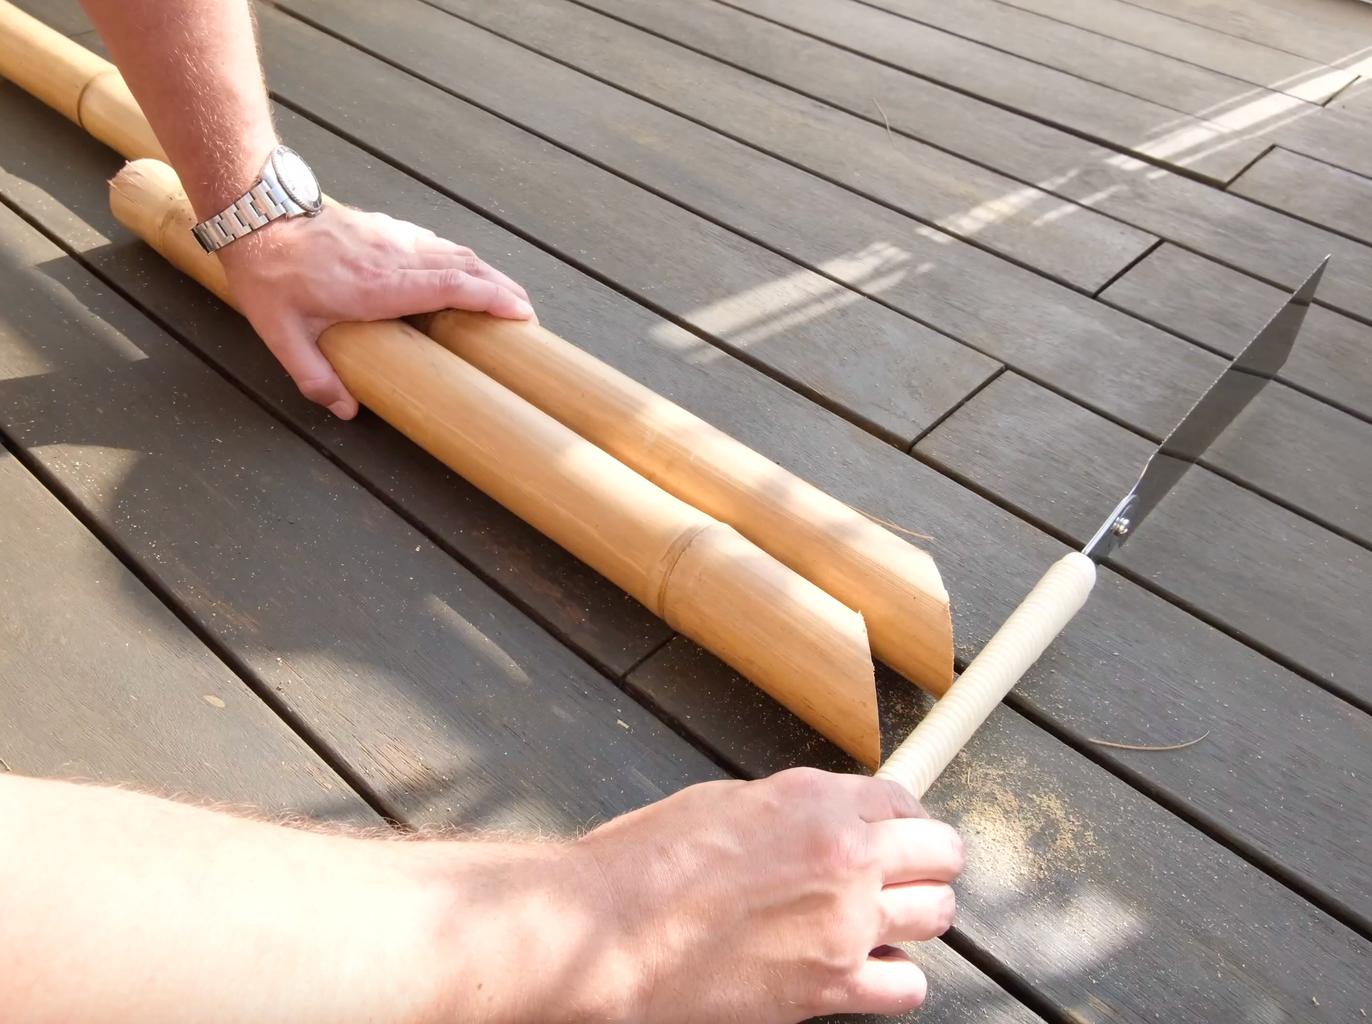 Cut the Bamboo